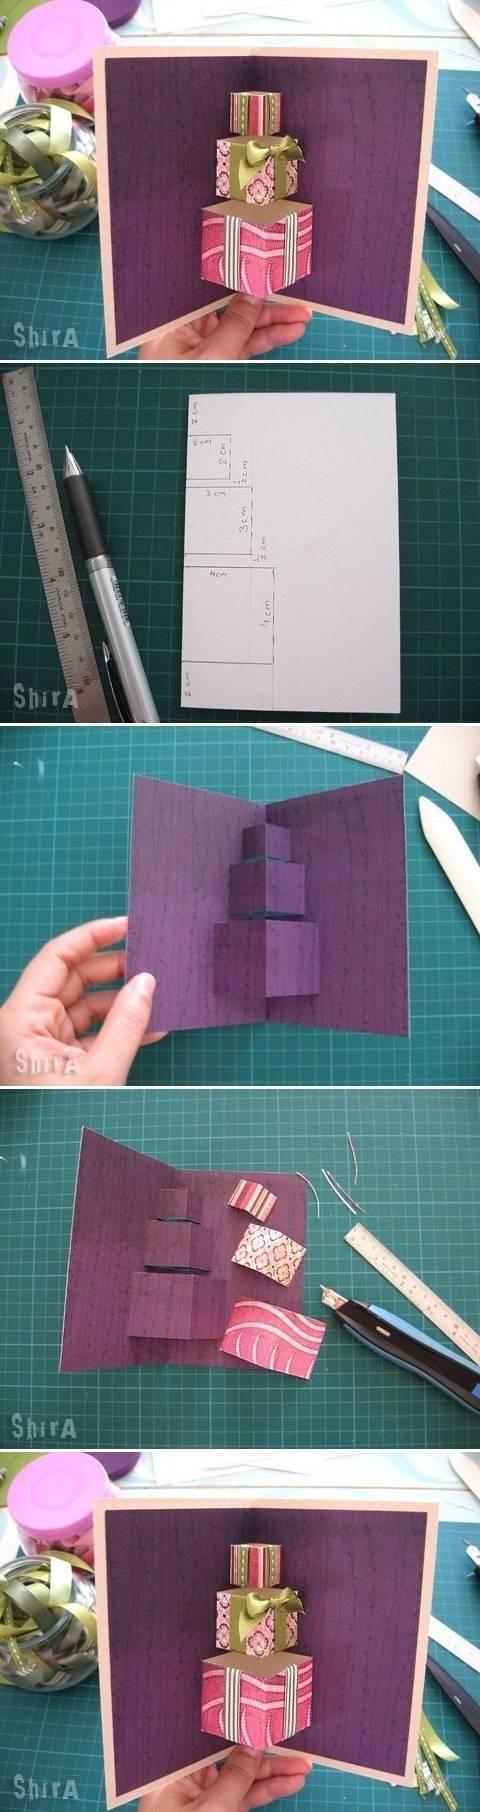 Diy Cards Diy Paper Craft Diy Simple 3d Gift Card Diy Projects